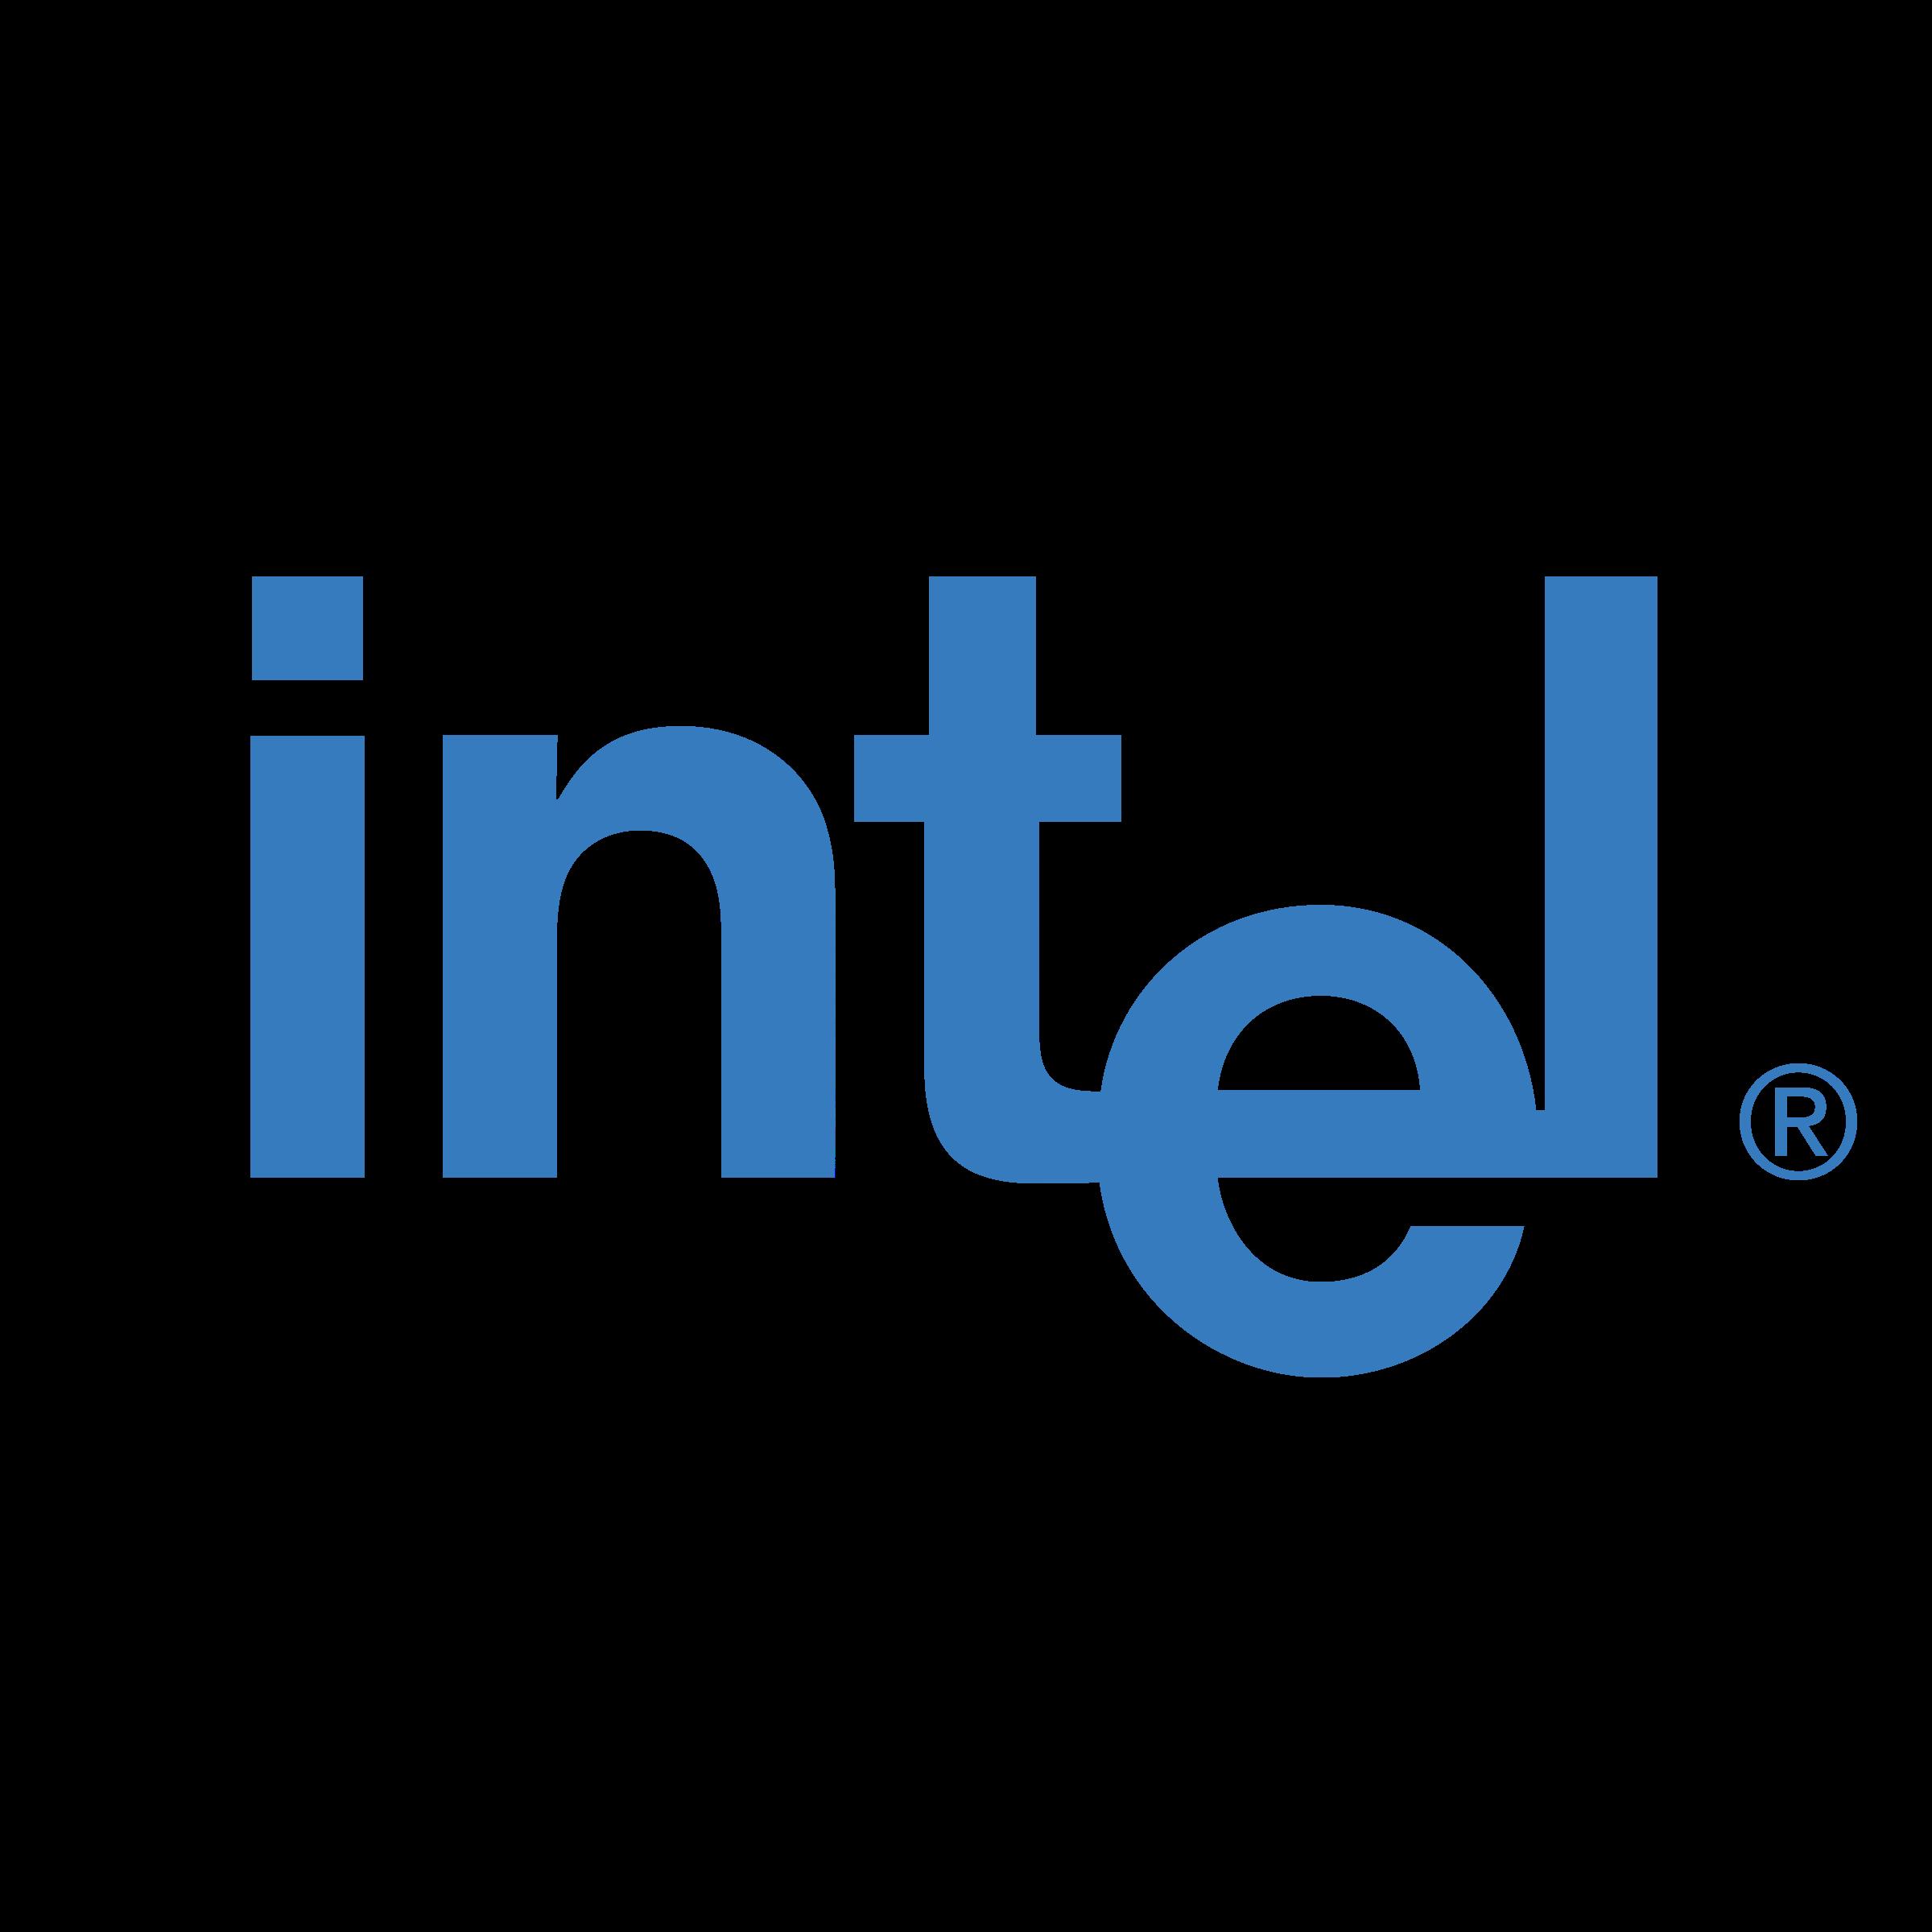 intel png logo white 12000 vector logos